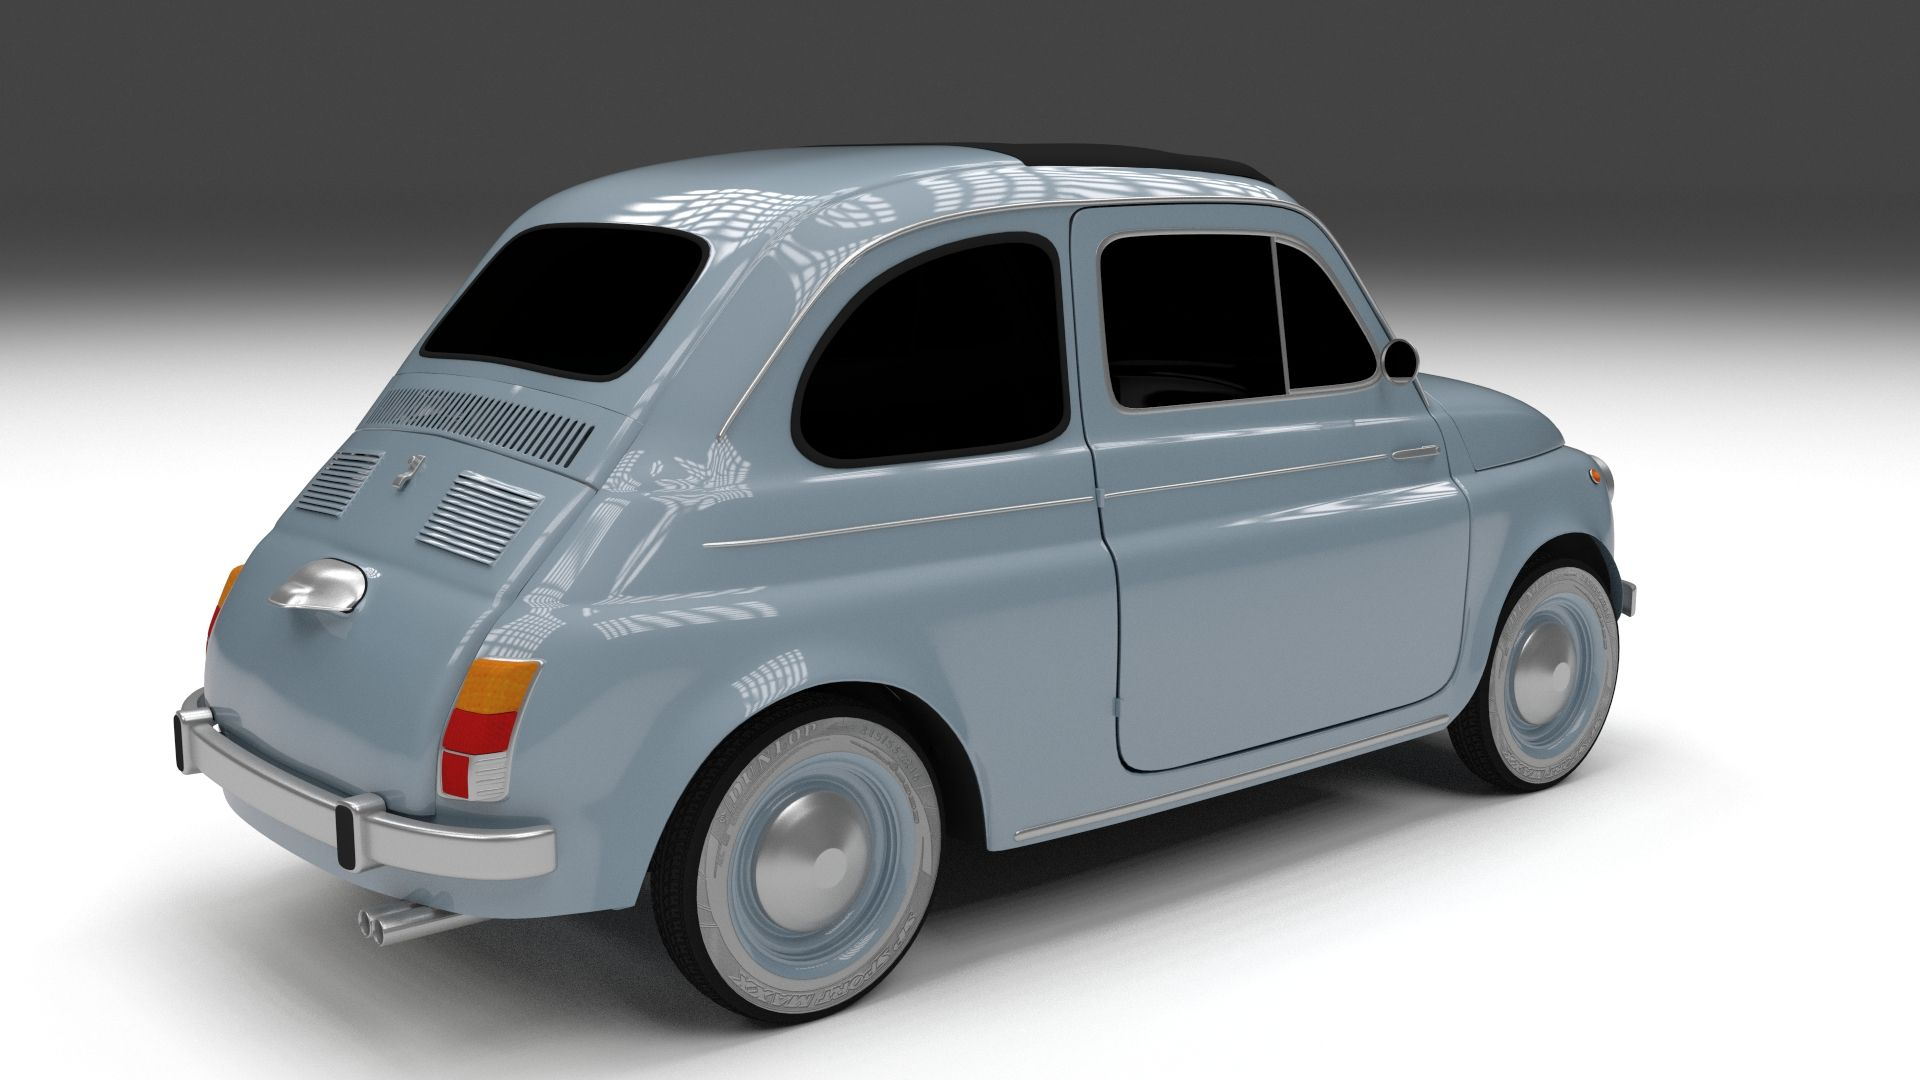 Fiat 500 Nuova 1957 Hdri 3d Model Nuova Fiat Model Hdri